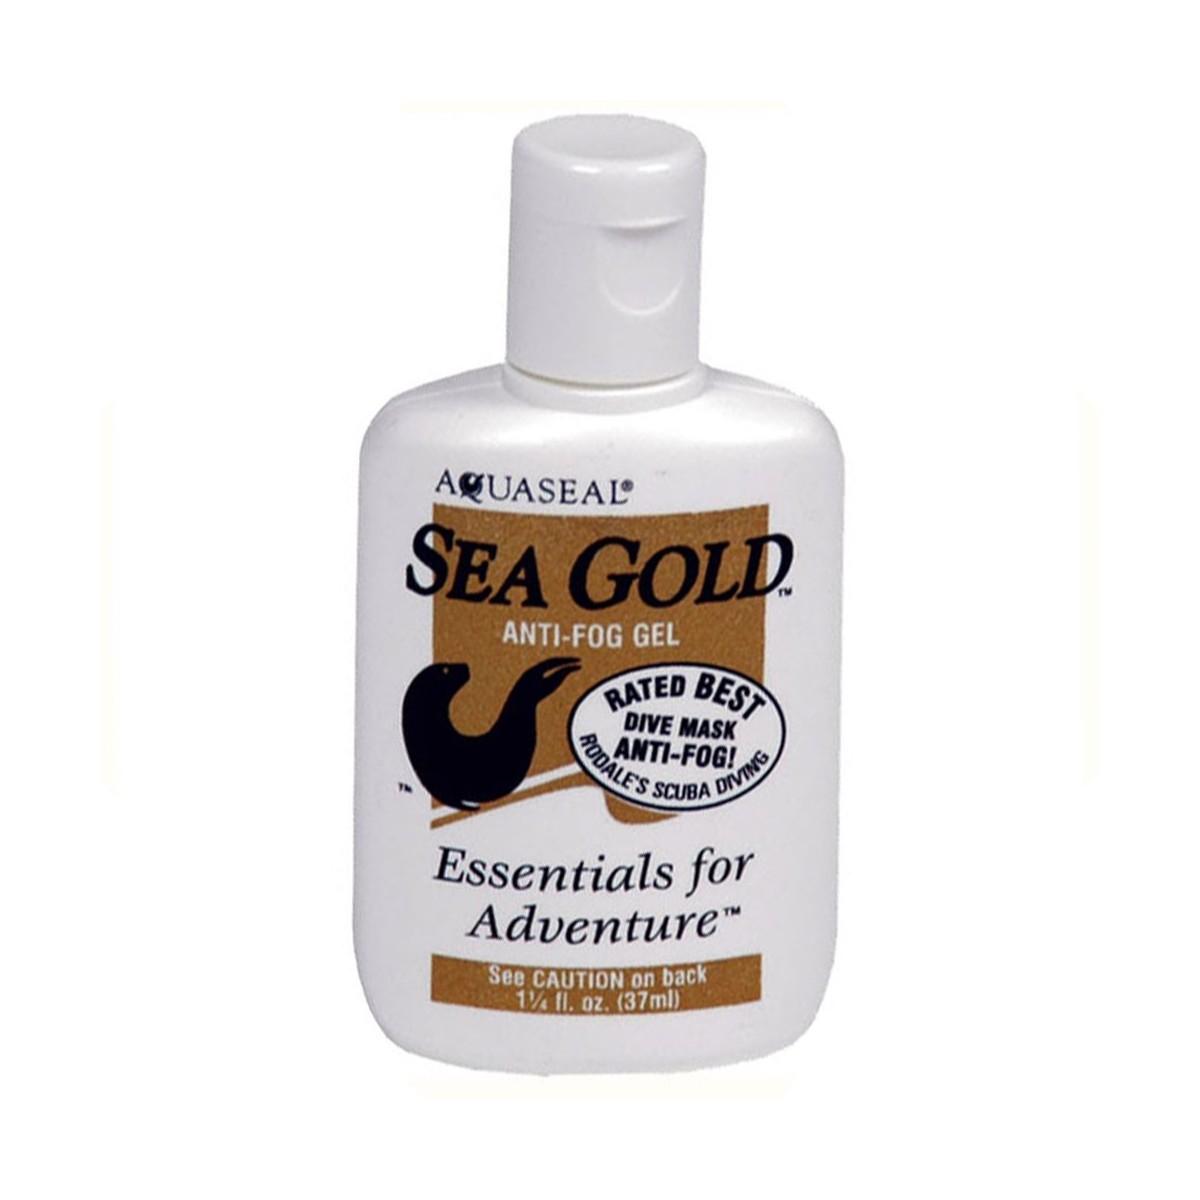 Sea Gold Defog